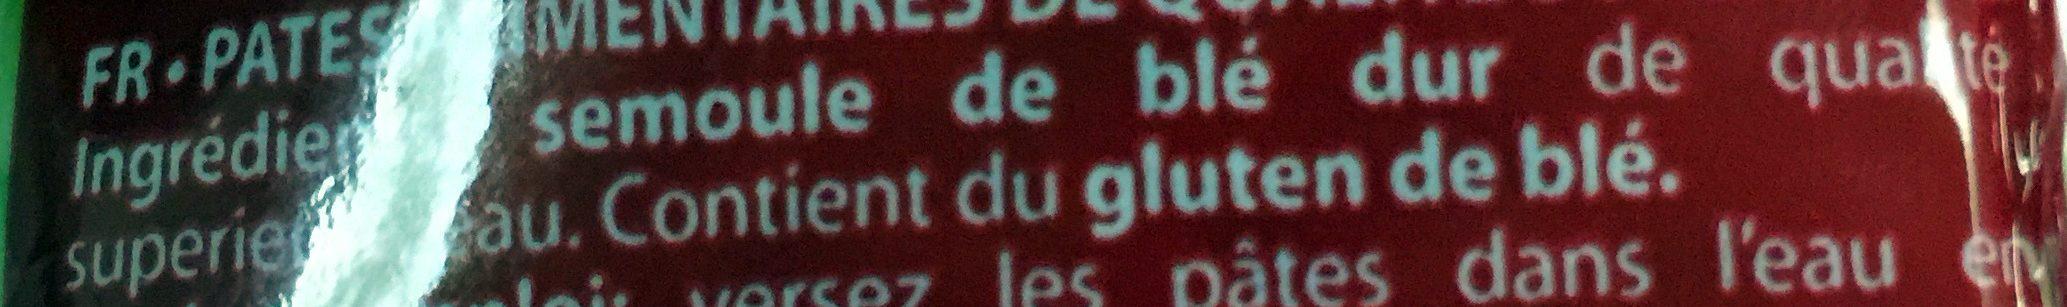 Pâtes Grecques - Ingrediënten - fr